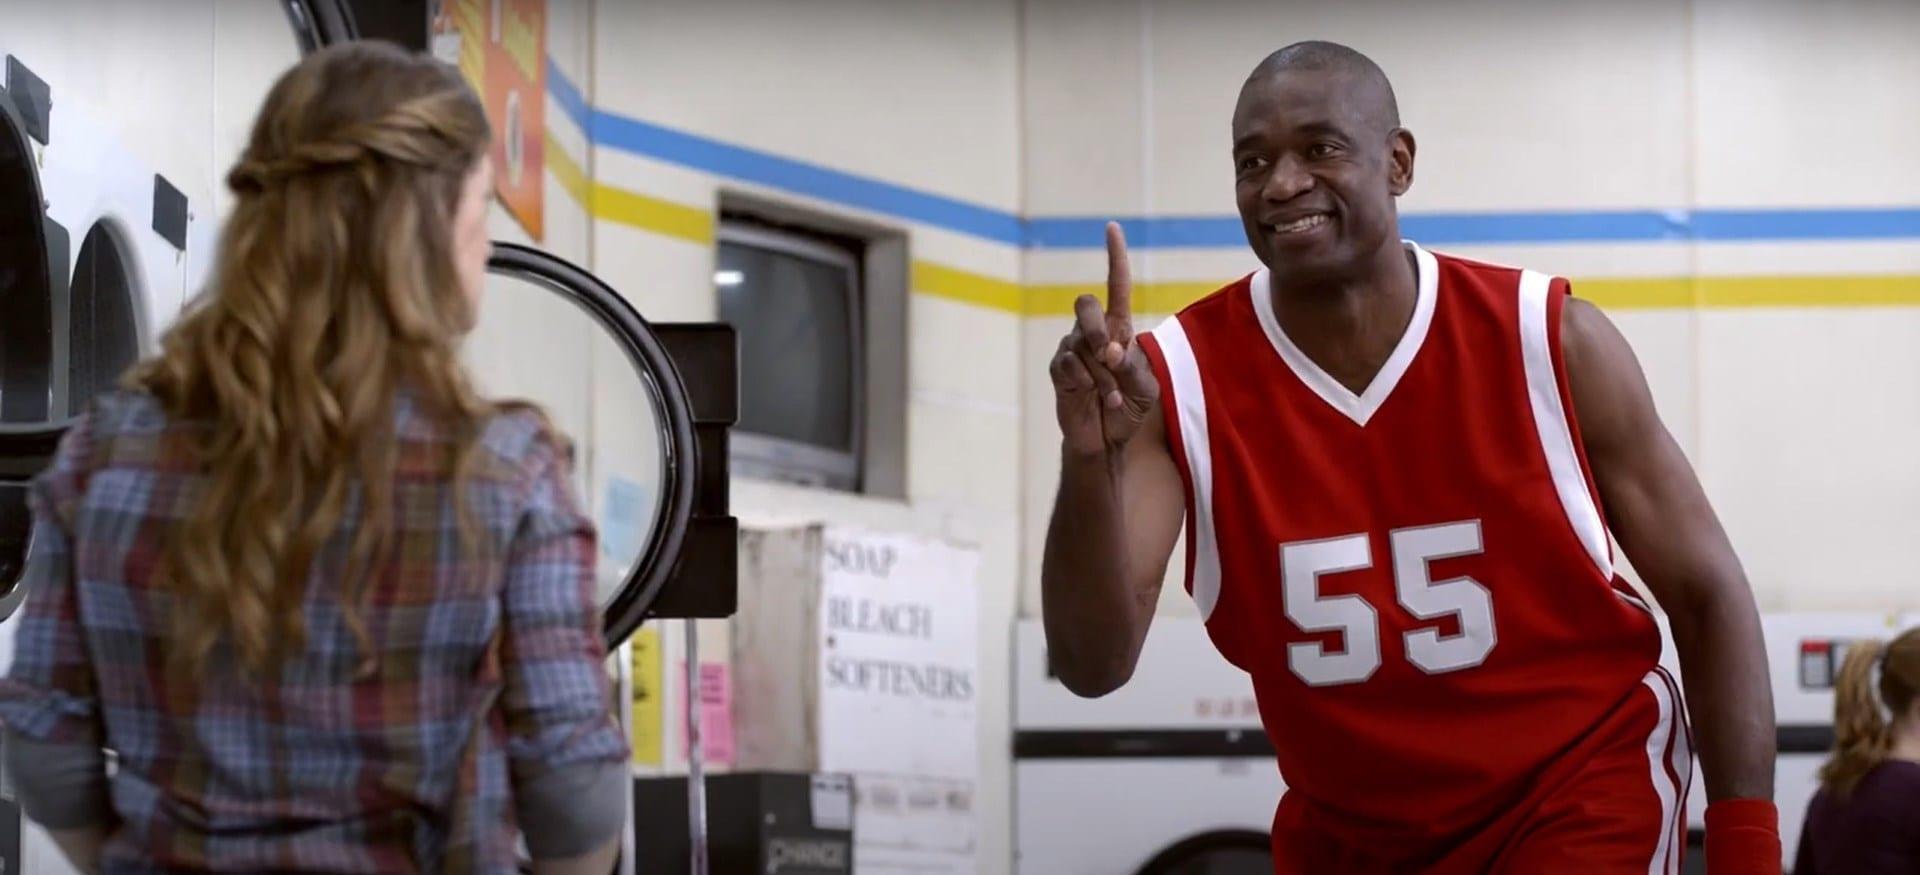 advert Dikembe Mutombo Blocks Your GEICO Insurance video